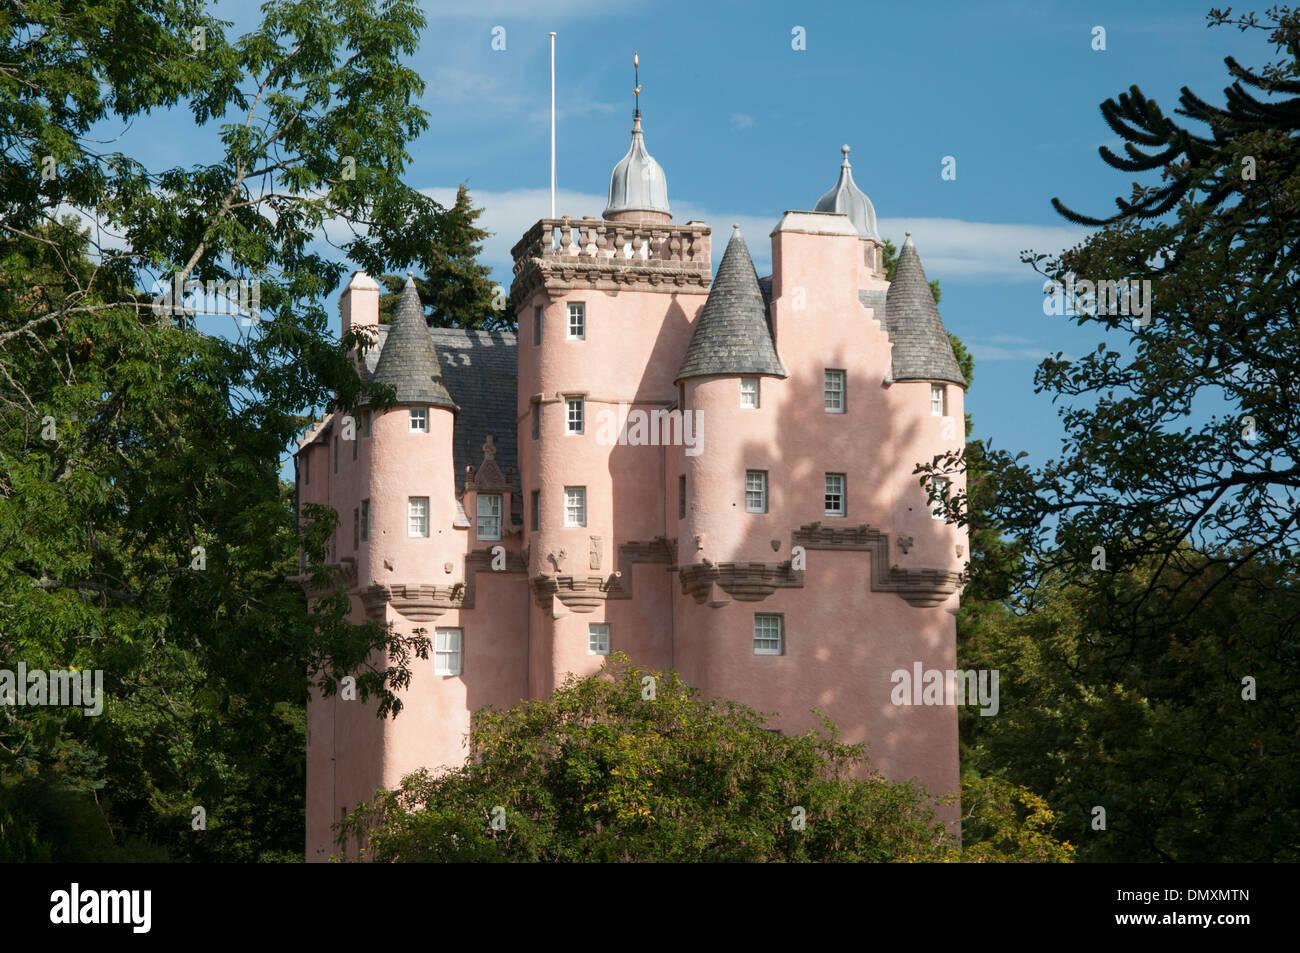 craigievar castle royal deeside a scottish castle - Stock Image